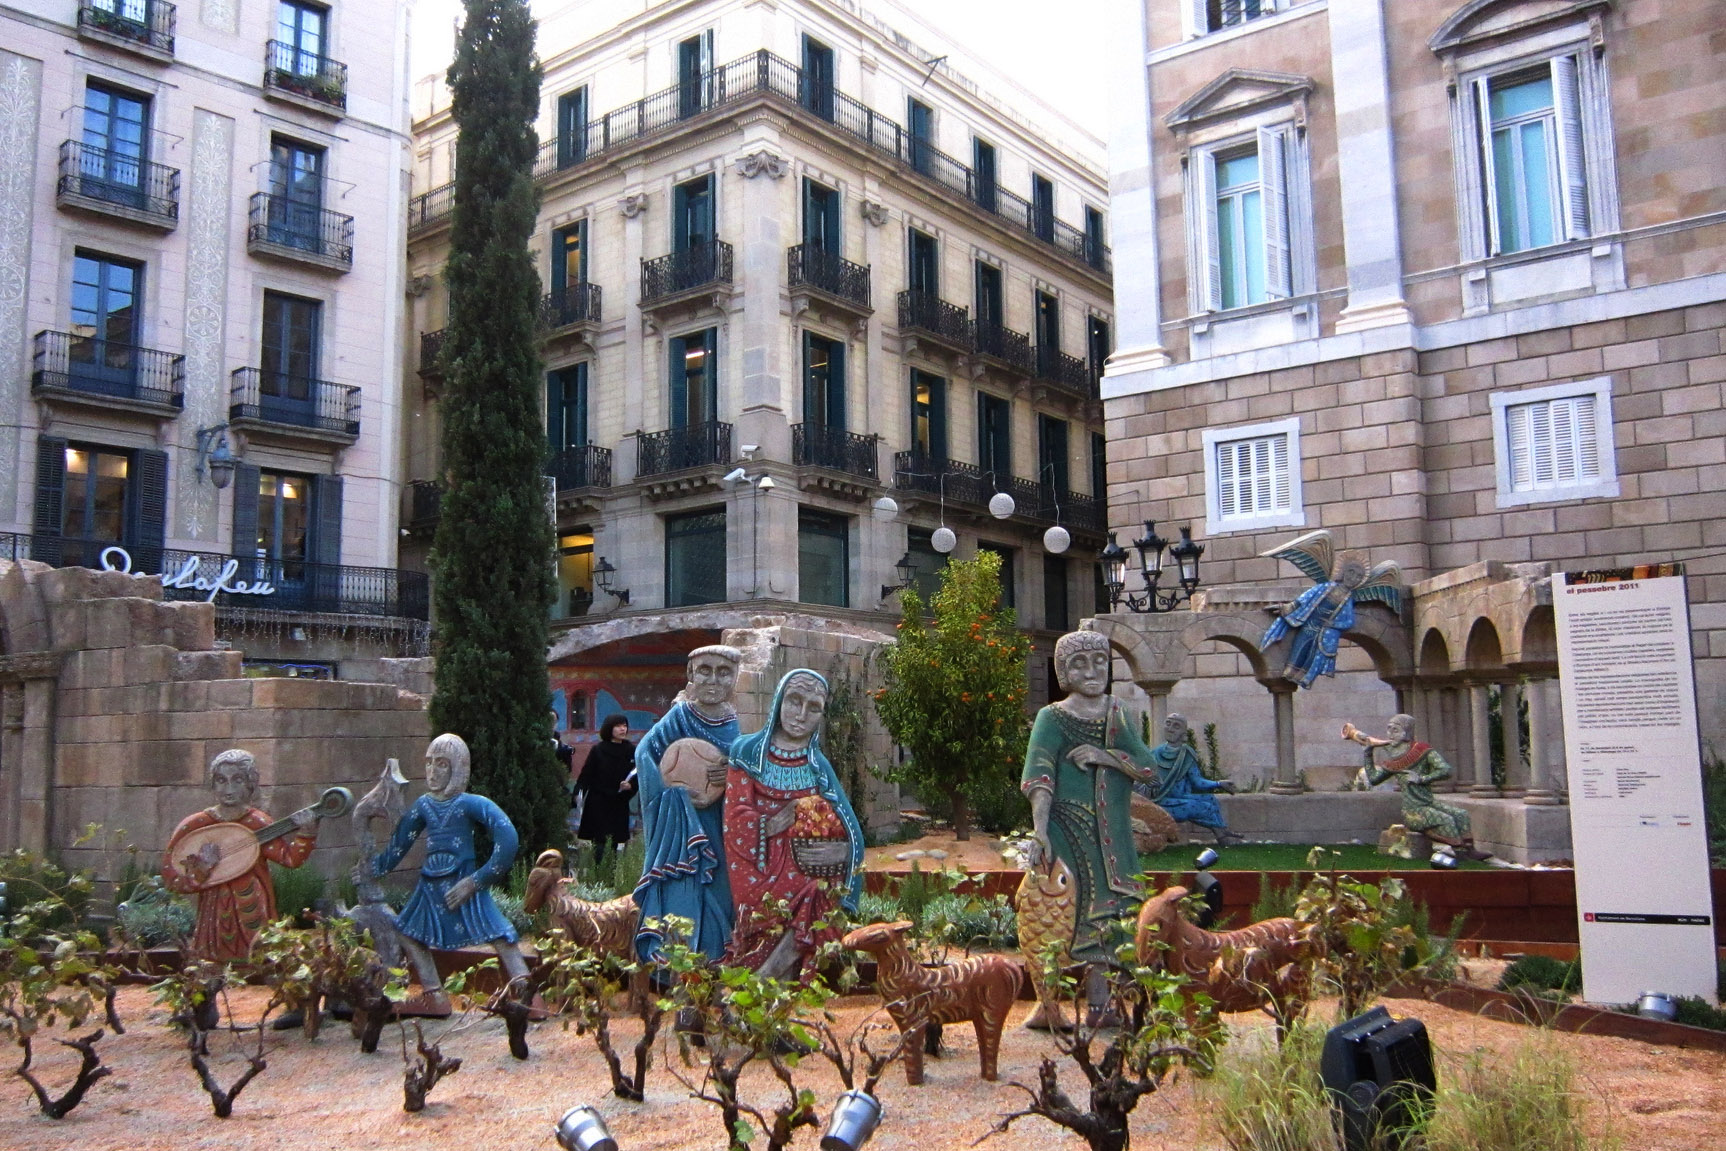 web-nativity-manger-christmas-barcelona-spain-melissa-delzio-cc